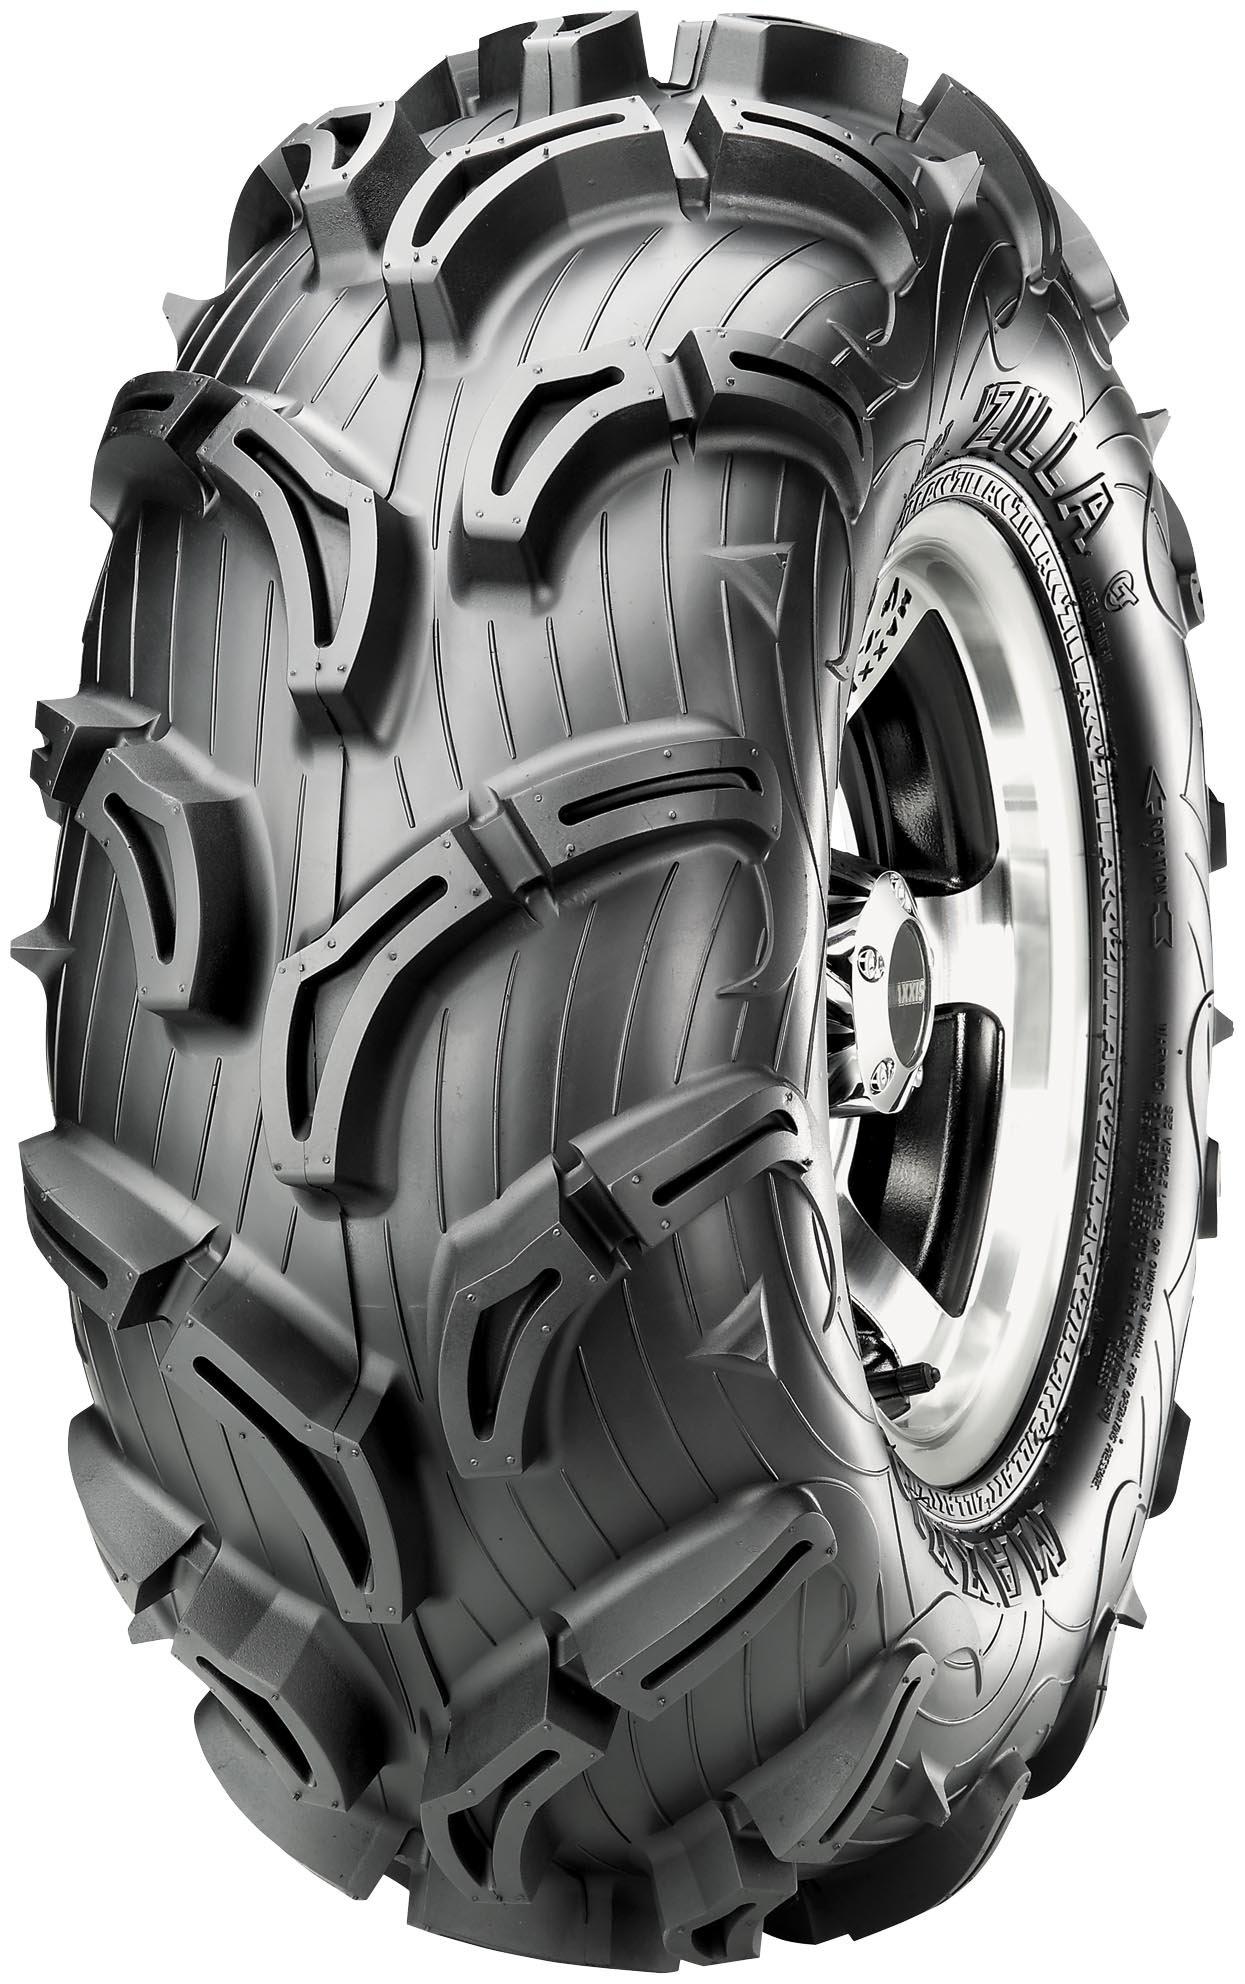 Maxxis MU02 Zilla Tire - Rear - 22x10x9 , Position: Rear, Tire Size: 22x10x9, Rim Size: 9, Tire Ply: 6, Tire Construction: Bias, Tire Type: ATV/UTV, Tire Application: Mud/Snow TM00433100